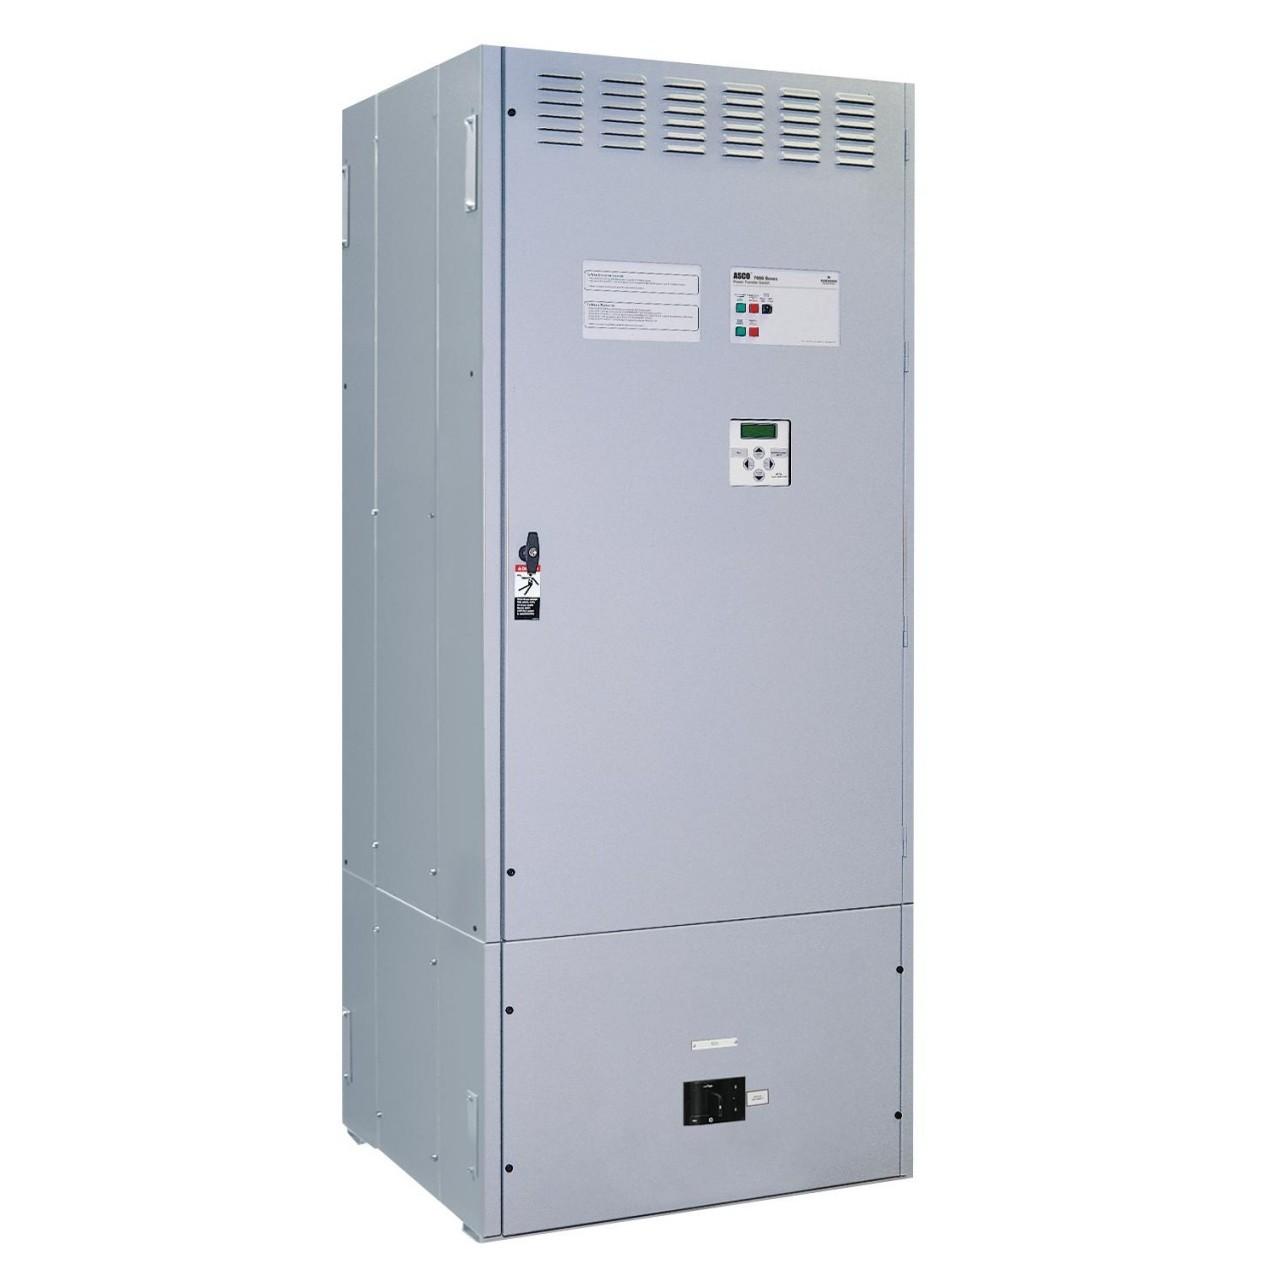 Asco 7000SE Auto Transfer Switch (3Ph, 1600A)